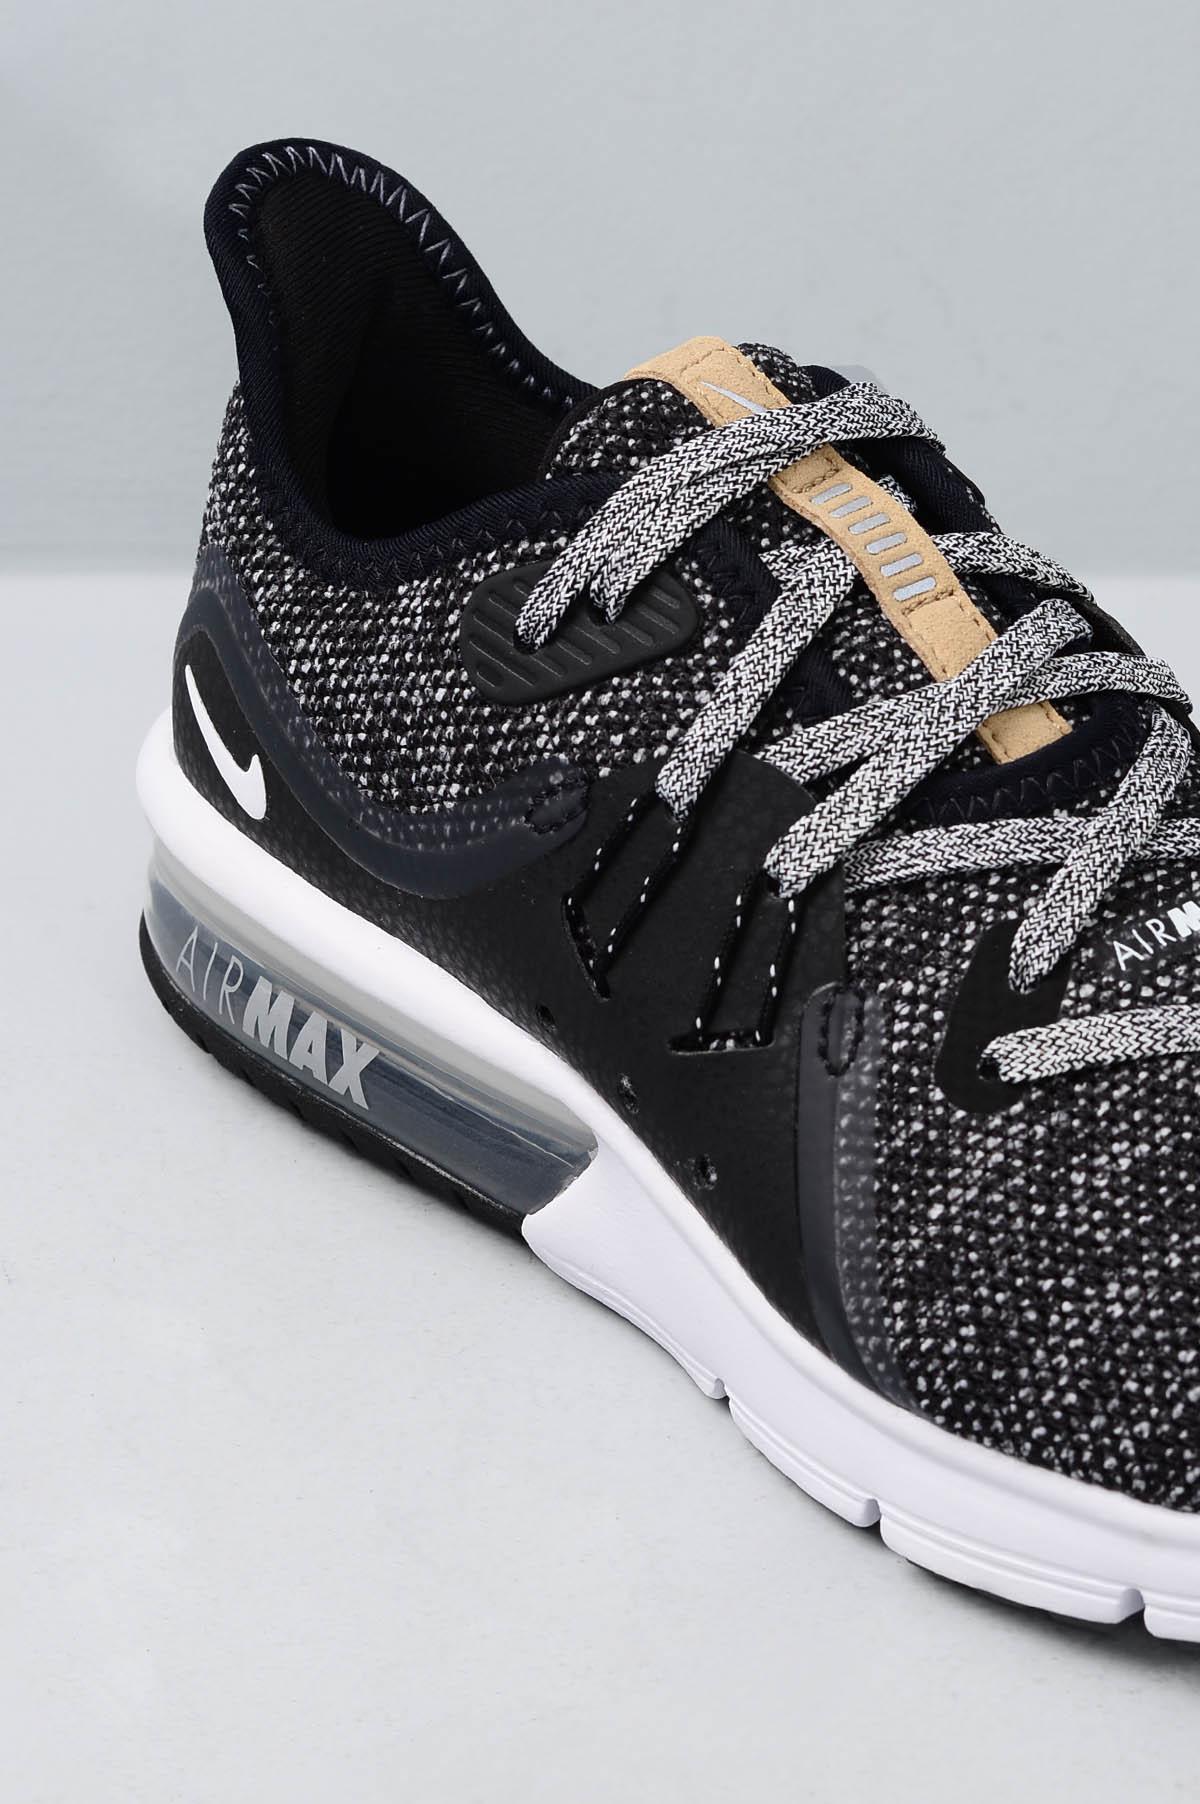 83bc06fe2 Tênis Feminino Nike Air Max Sequent 3 TEC - PRETO - Mundial Calçados